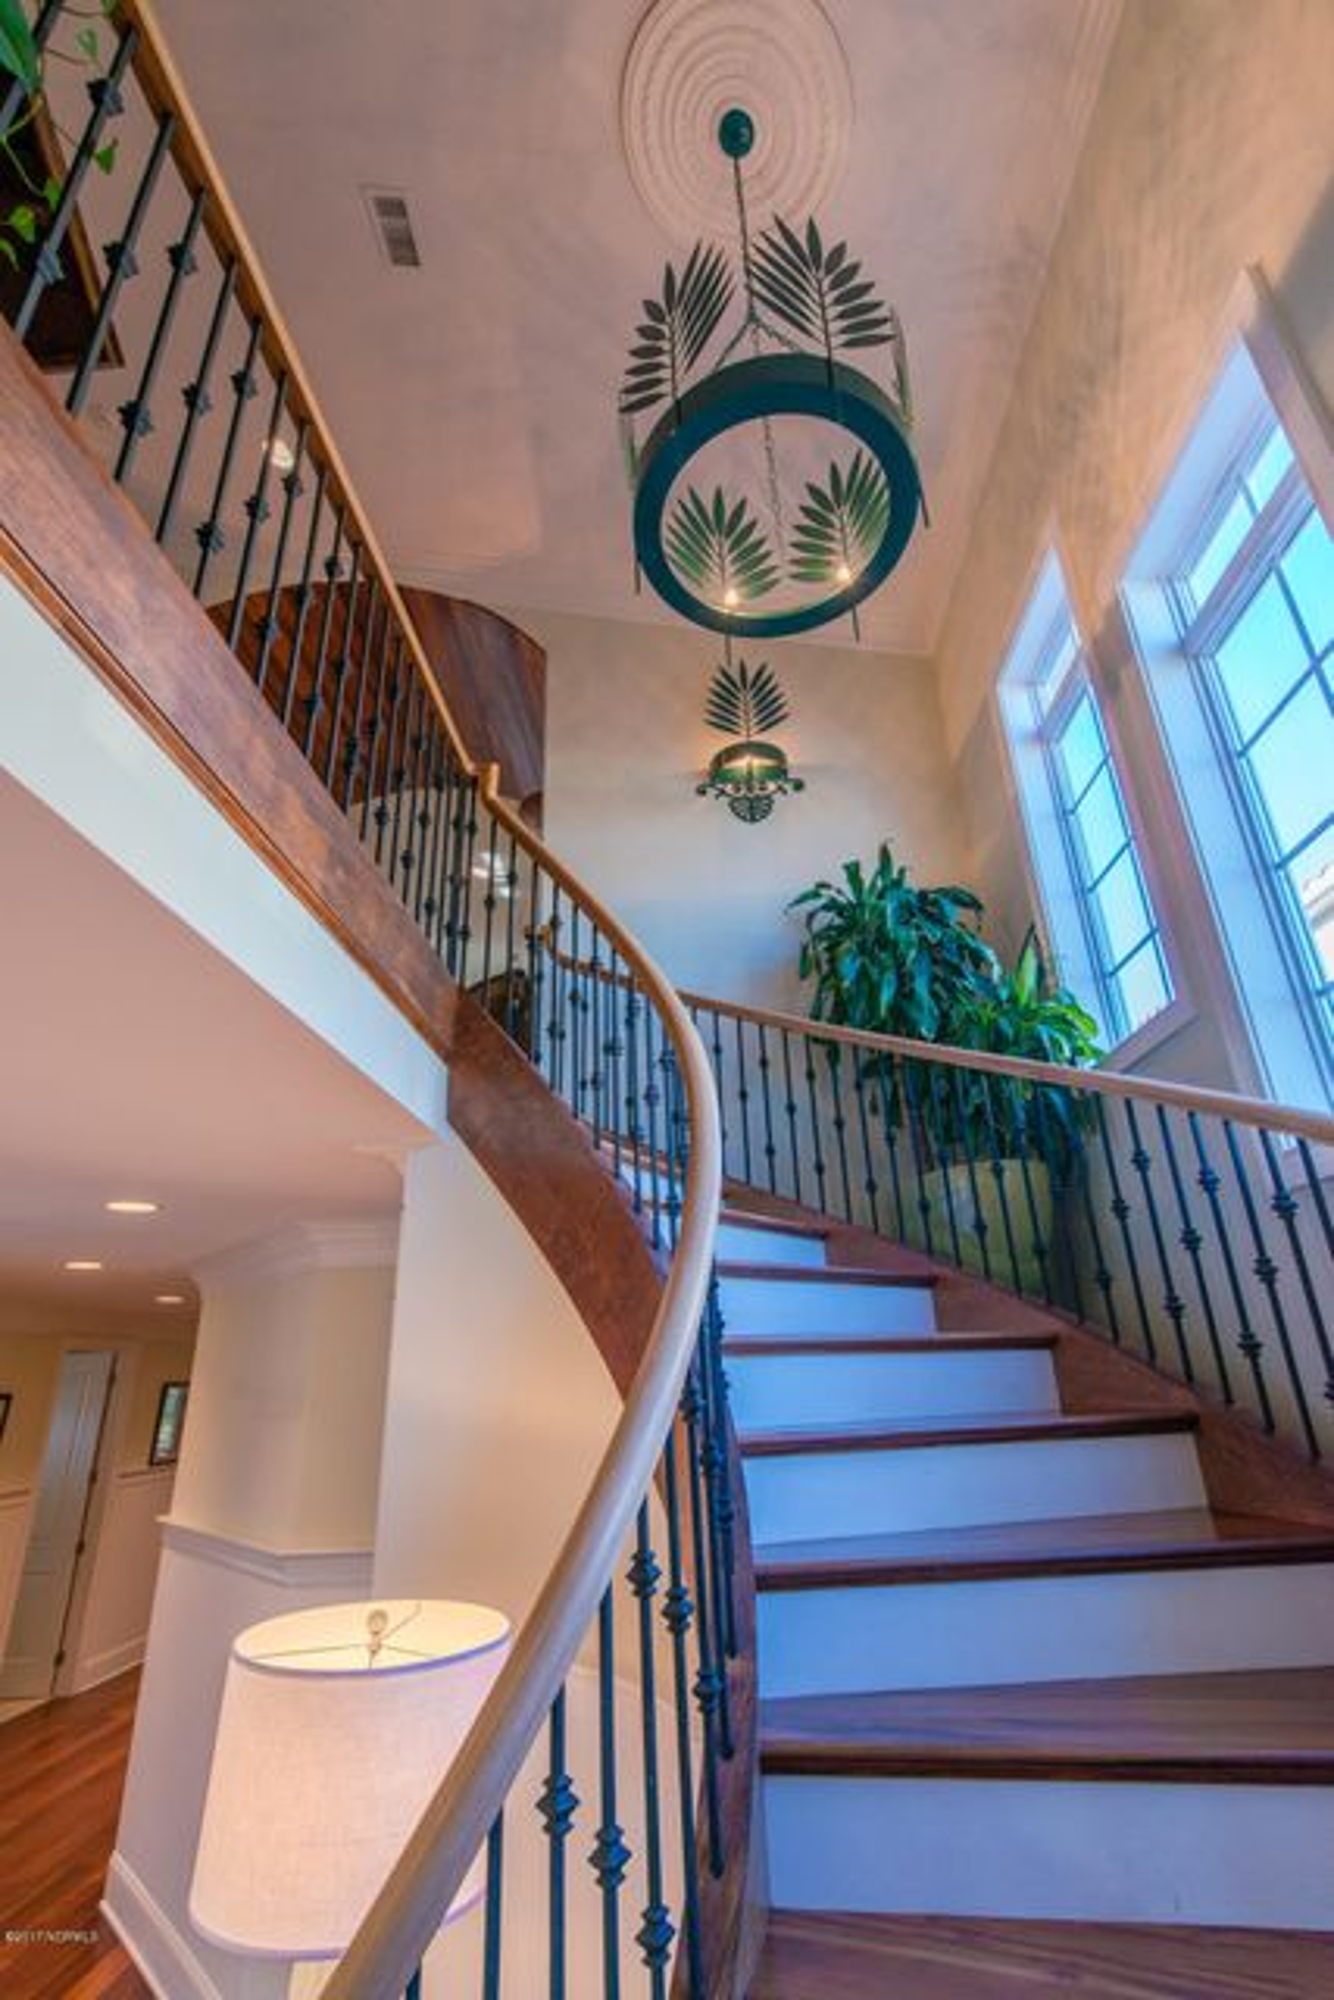 Ocean Isle Beach Real Estate - http://cdn.resize.sparkplatform.com/ncr/1024x768/true/20170829152341113006000000-o.jpg